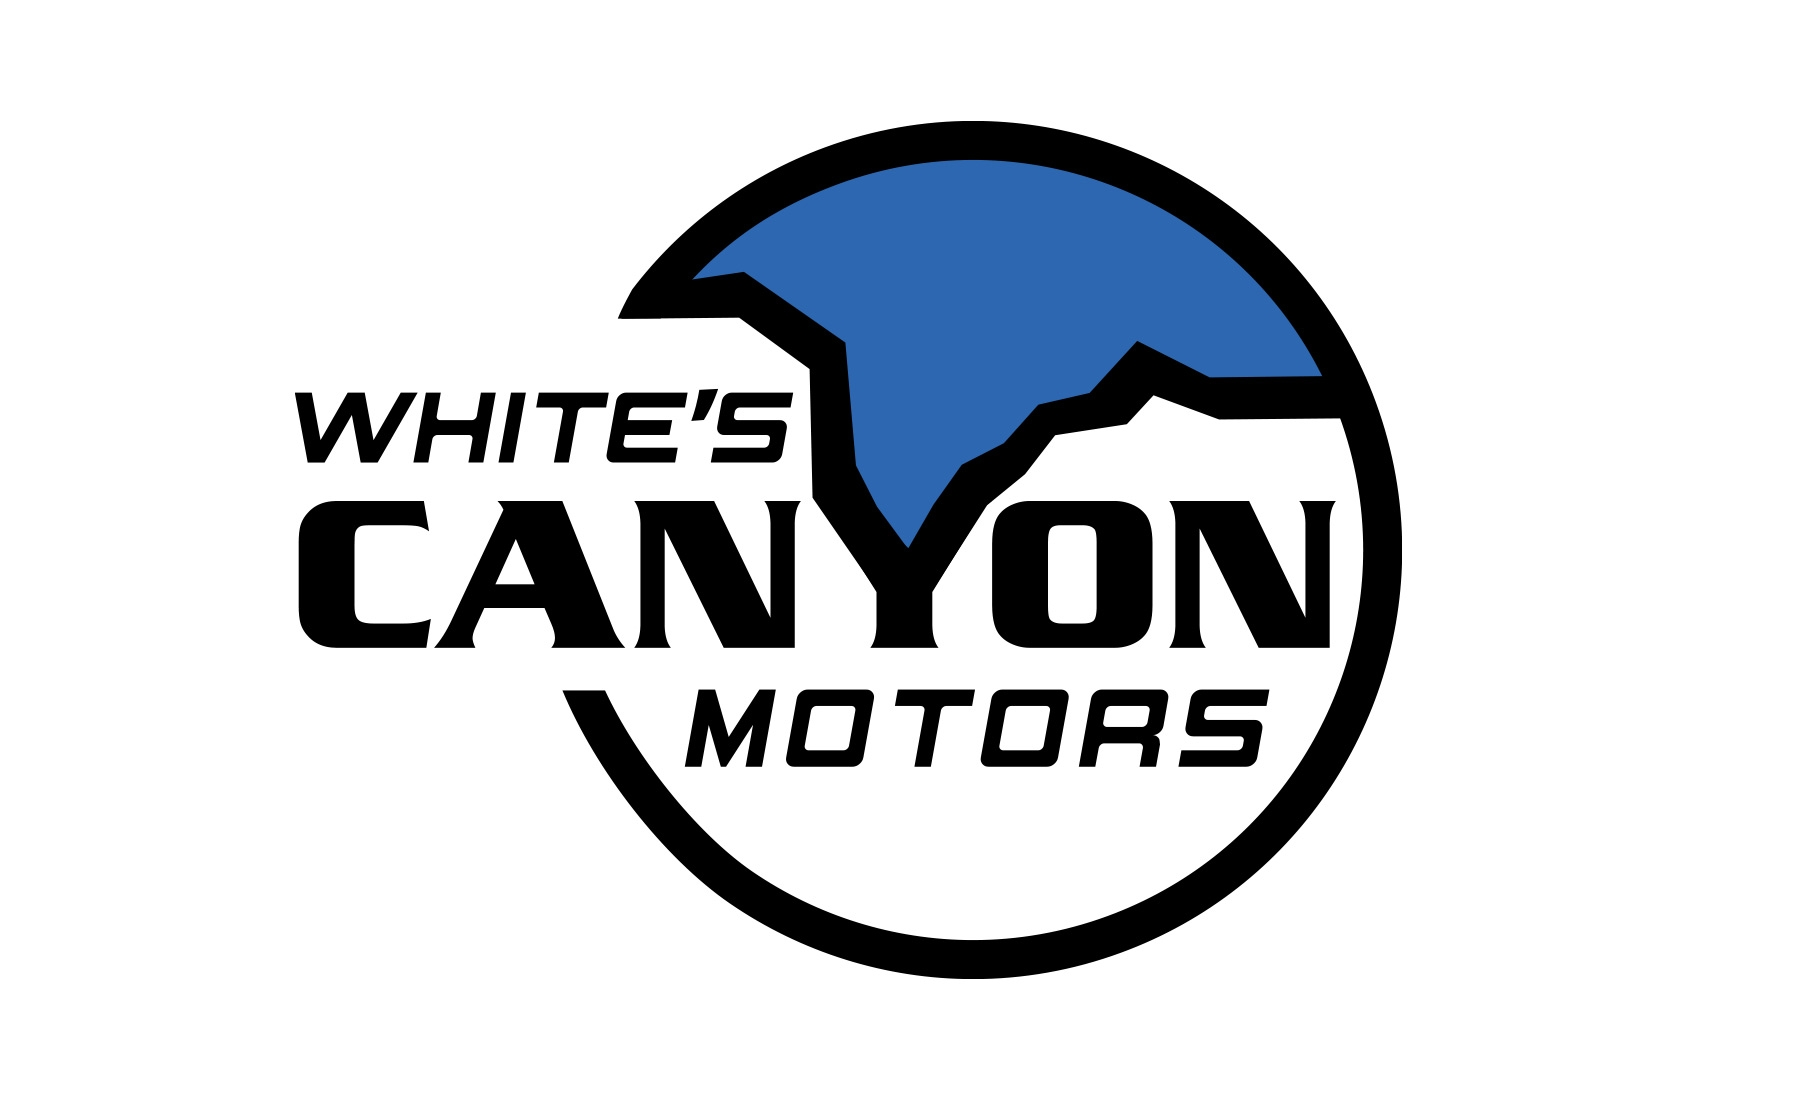 White's Canyon Motors logo